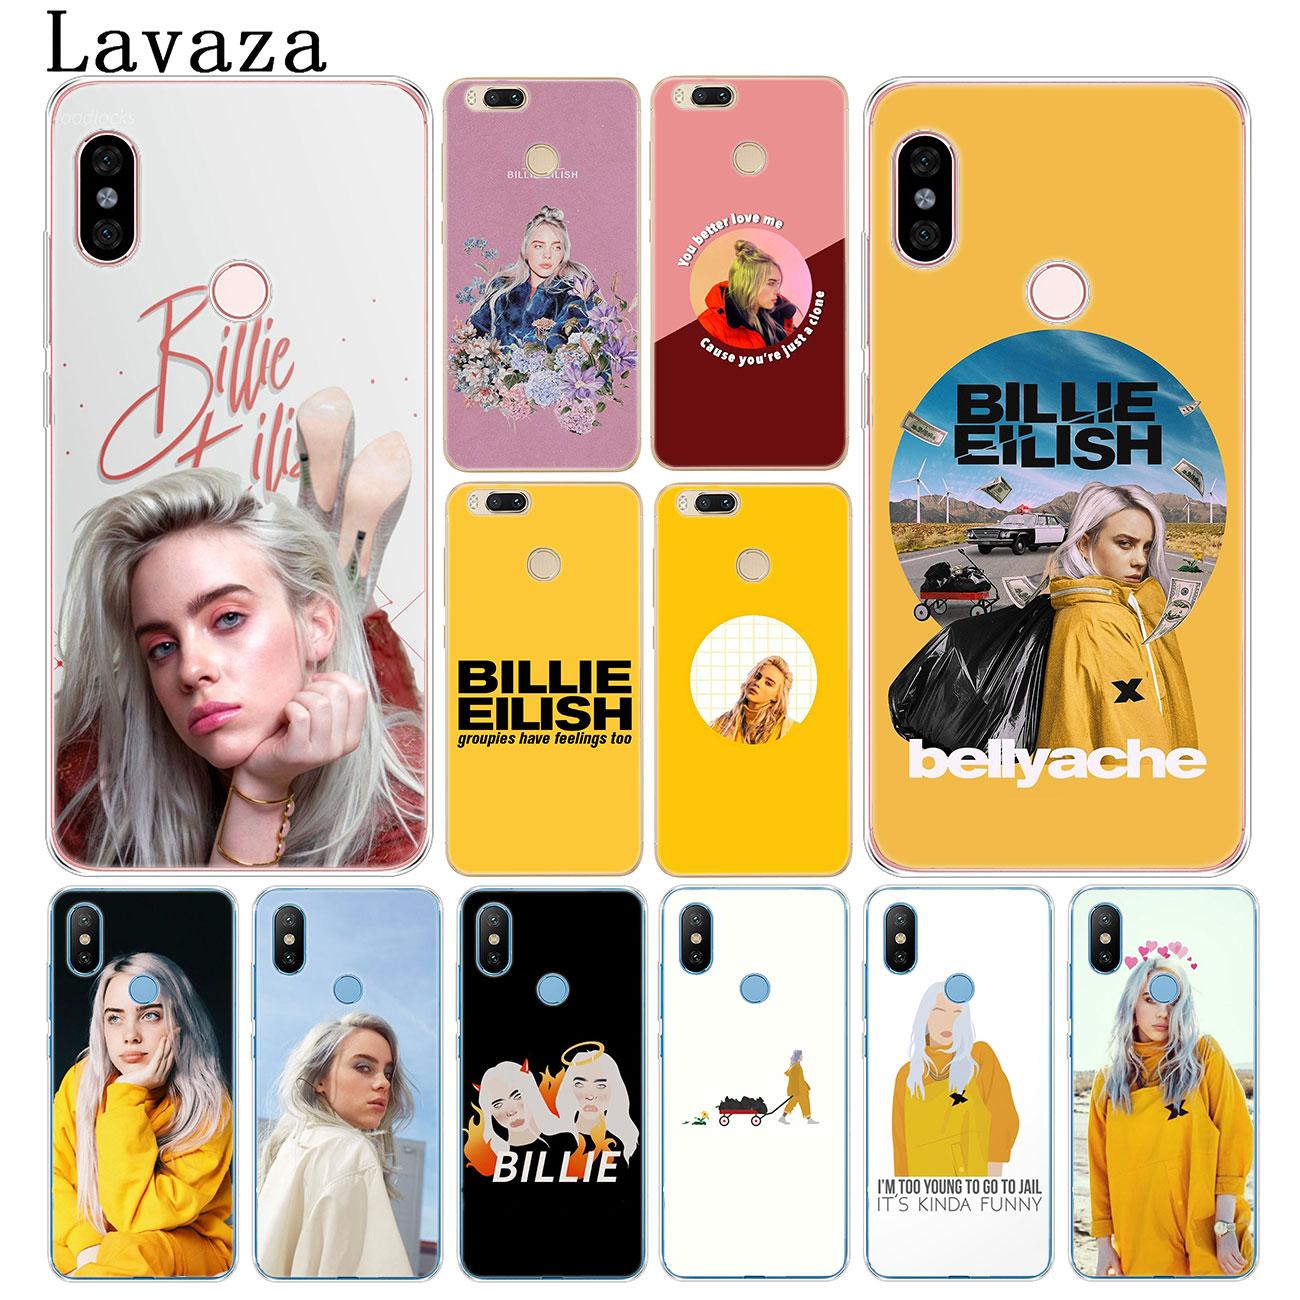 Жесткий чехол для телефона Lavaza Hot Billie Eilish Music Singer для Xiaomi Redmi K30 K20 8A 7A 5A 6A Note 8 8T 7 5 6 Pro